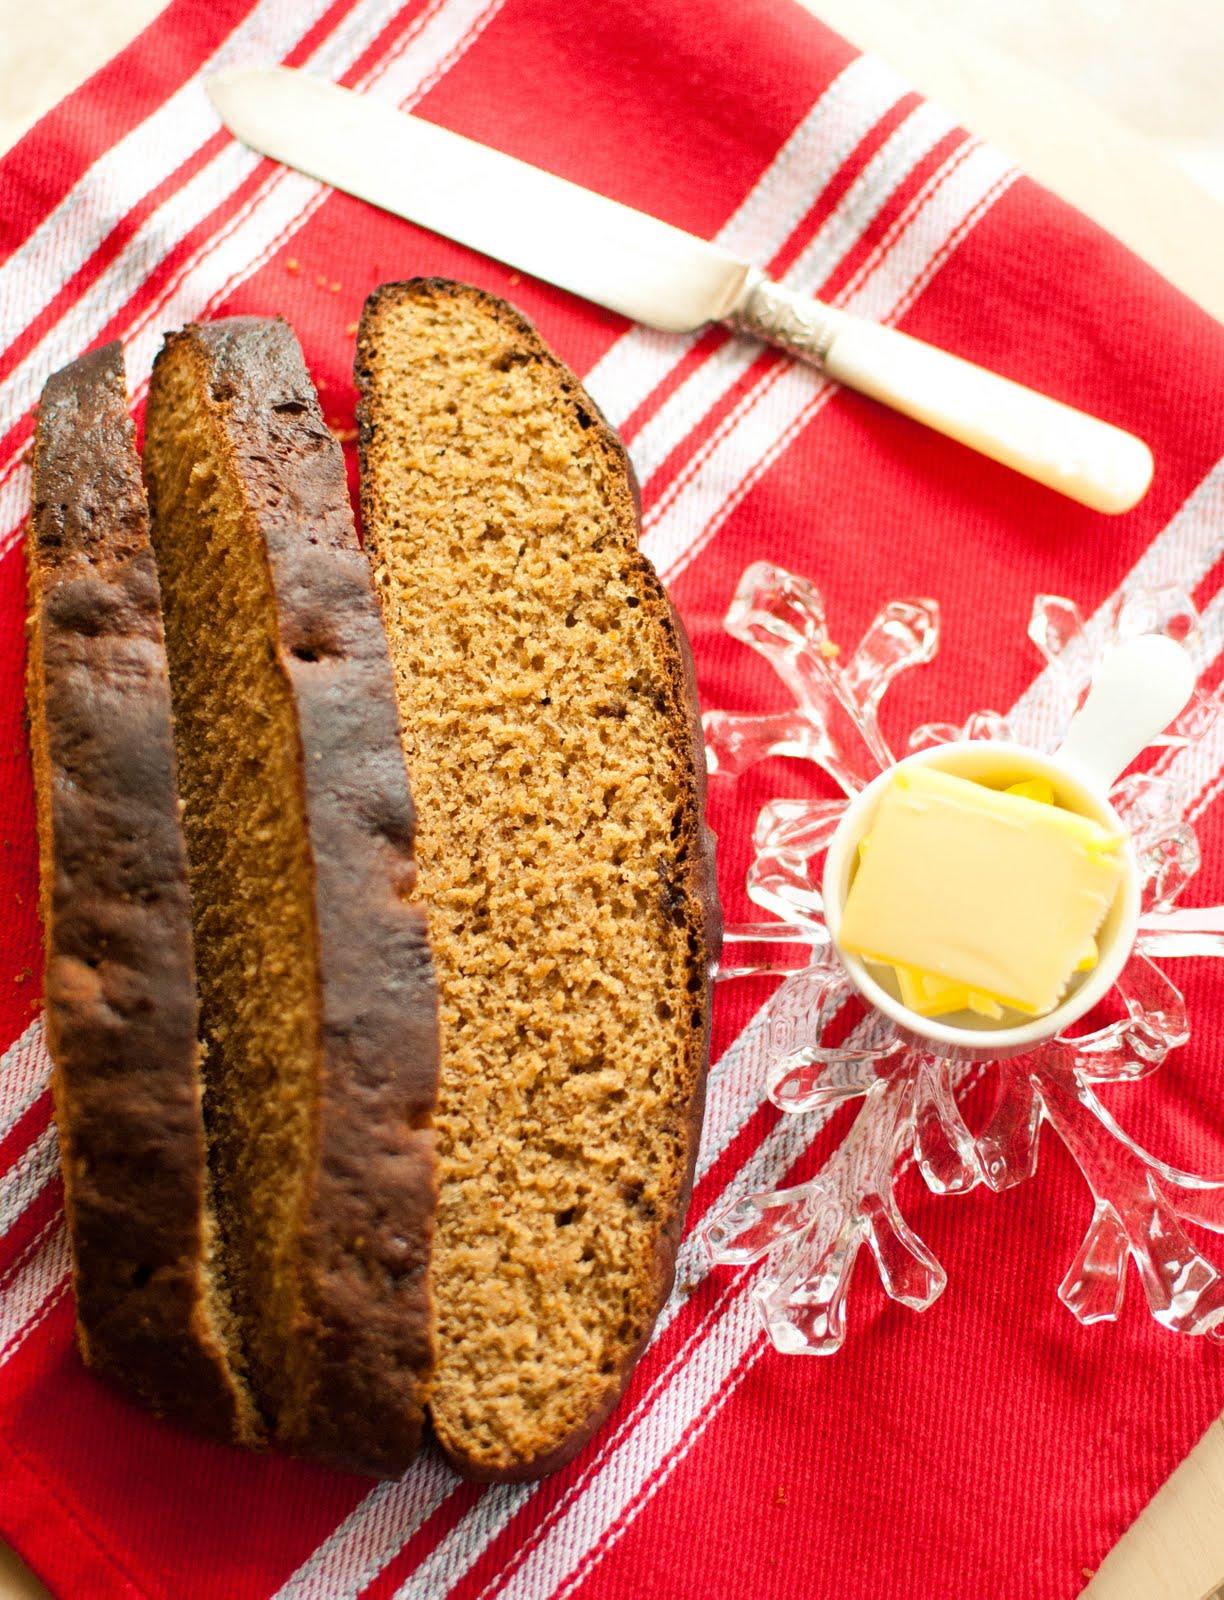 Scandi Home: Joululimppu - Finnish Christmas Bread